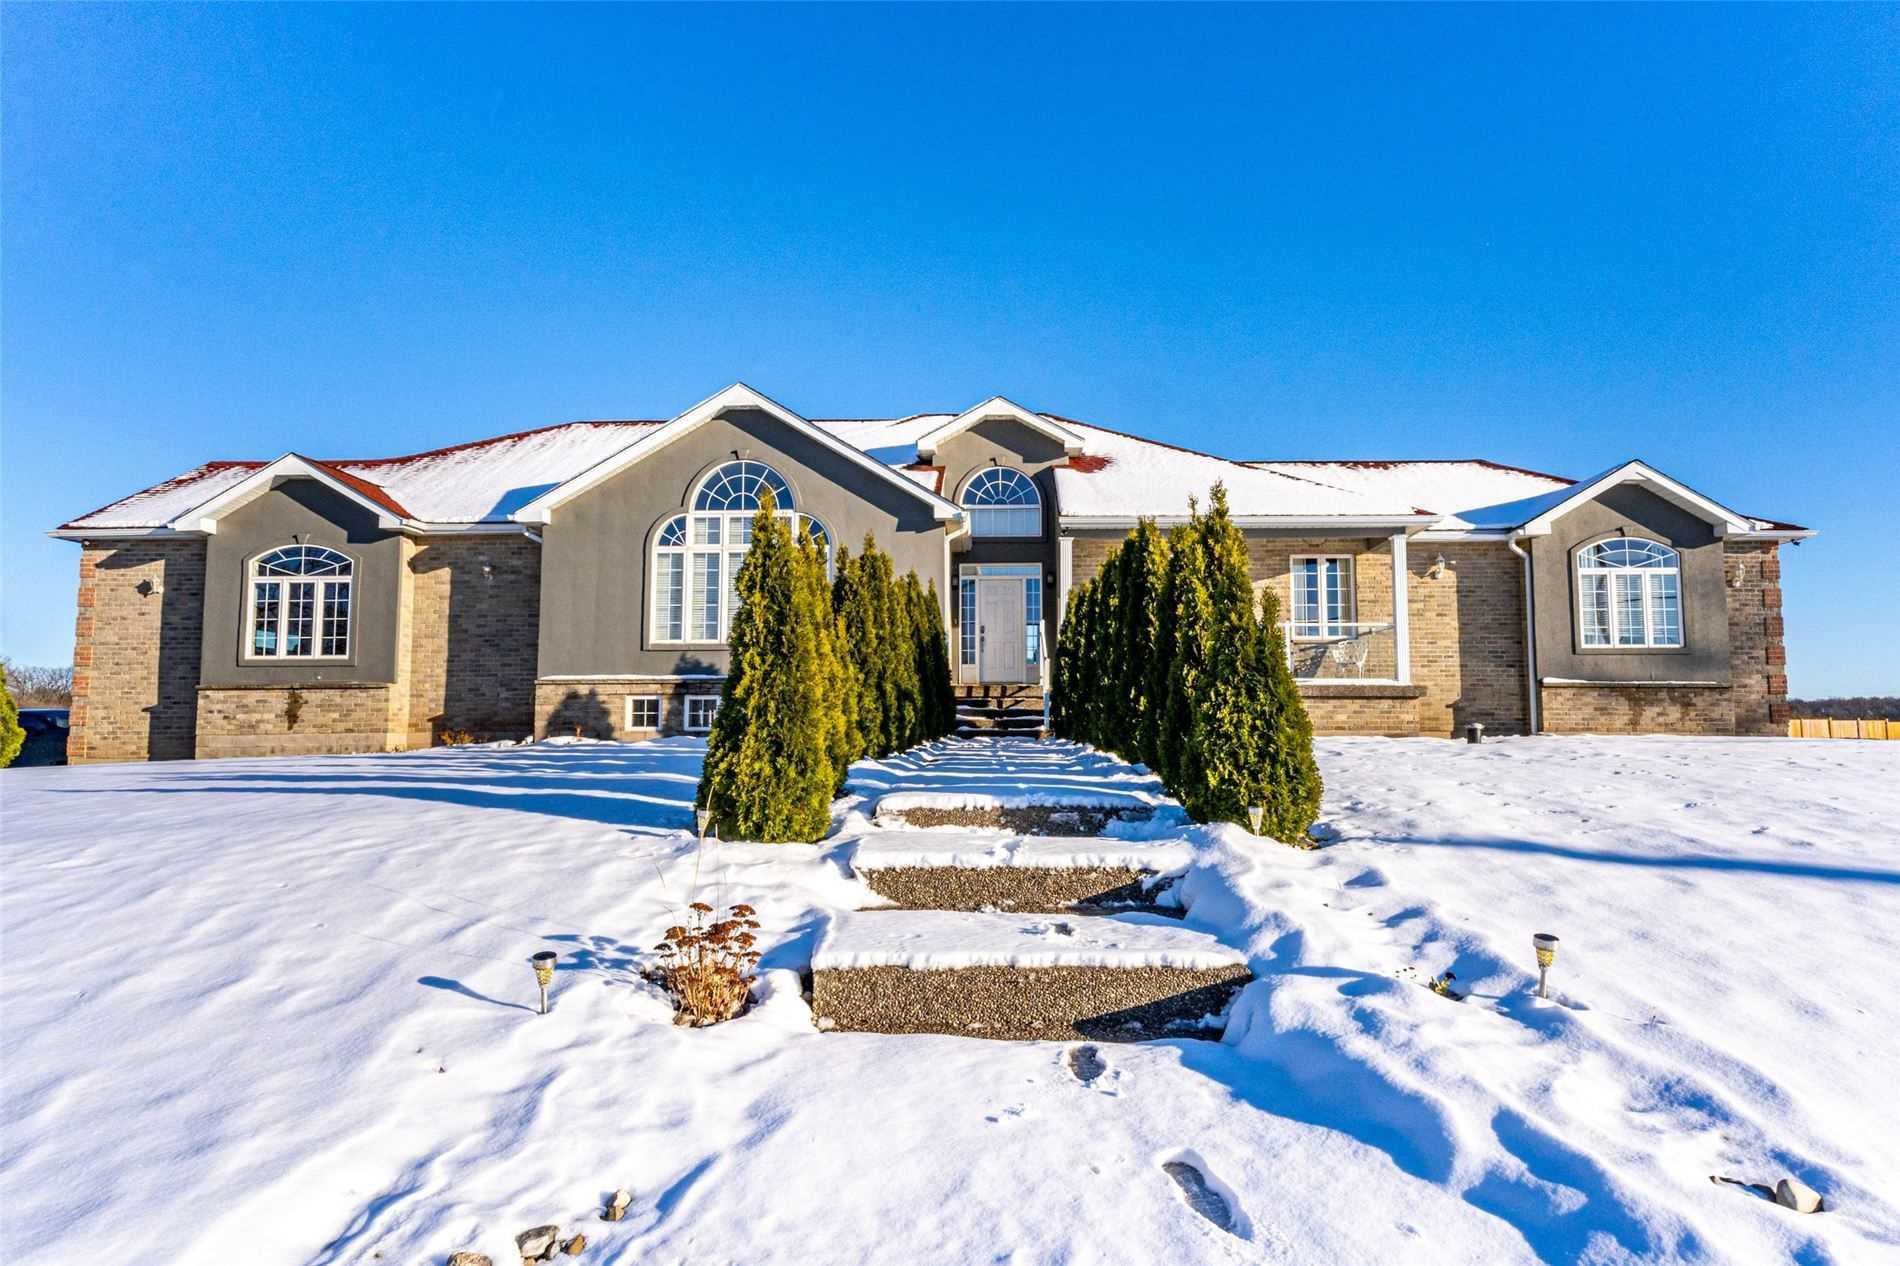 440 Hwy #54 St, Haldimand, Ontario N0A 1R0, 4 Bedrooms Bedrooms, ,2 BathroomsBathrooms,Detached,For Sale,Hwy #54,X5055655